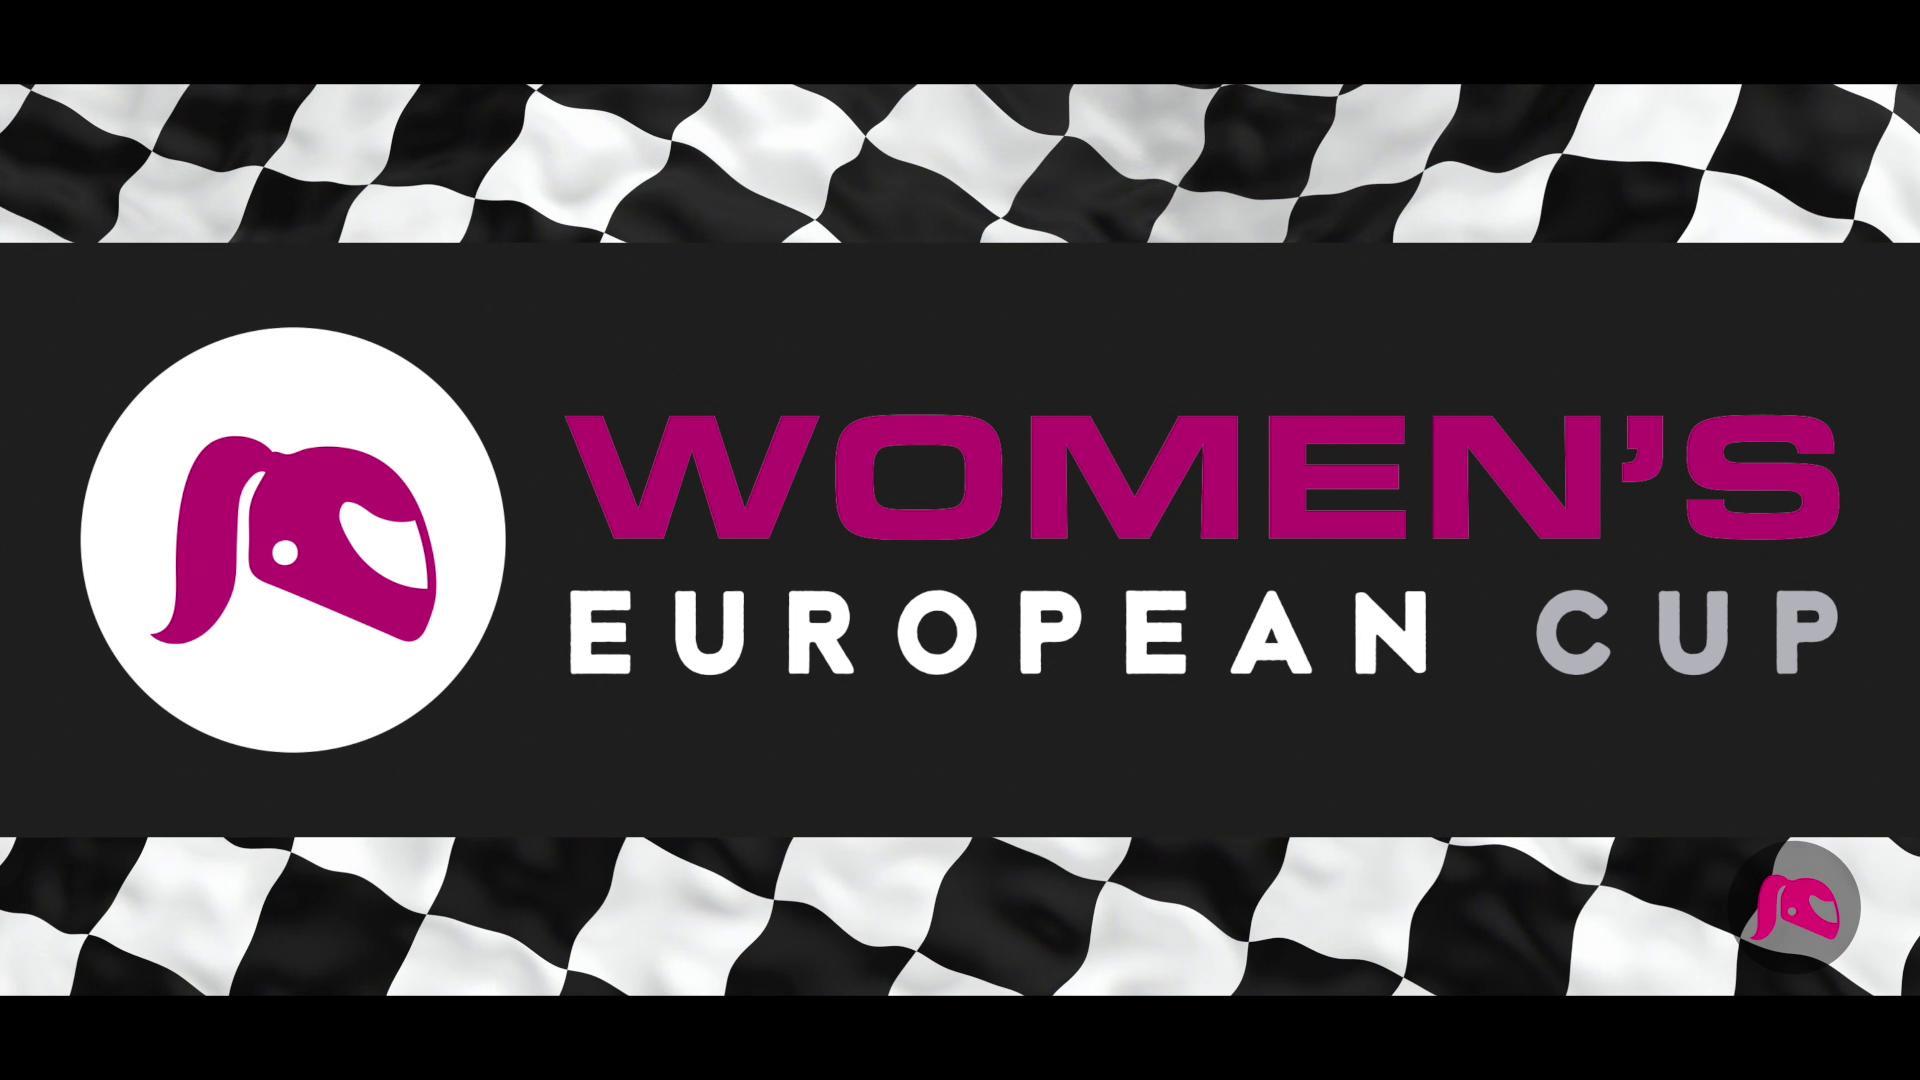 Women's European Cup - Video